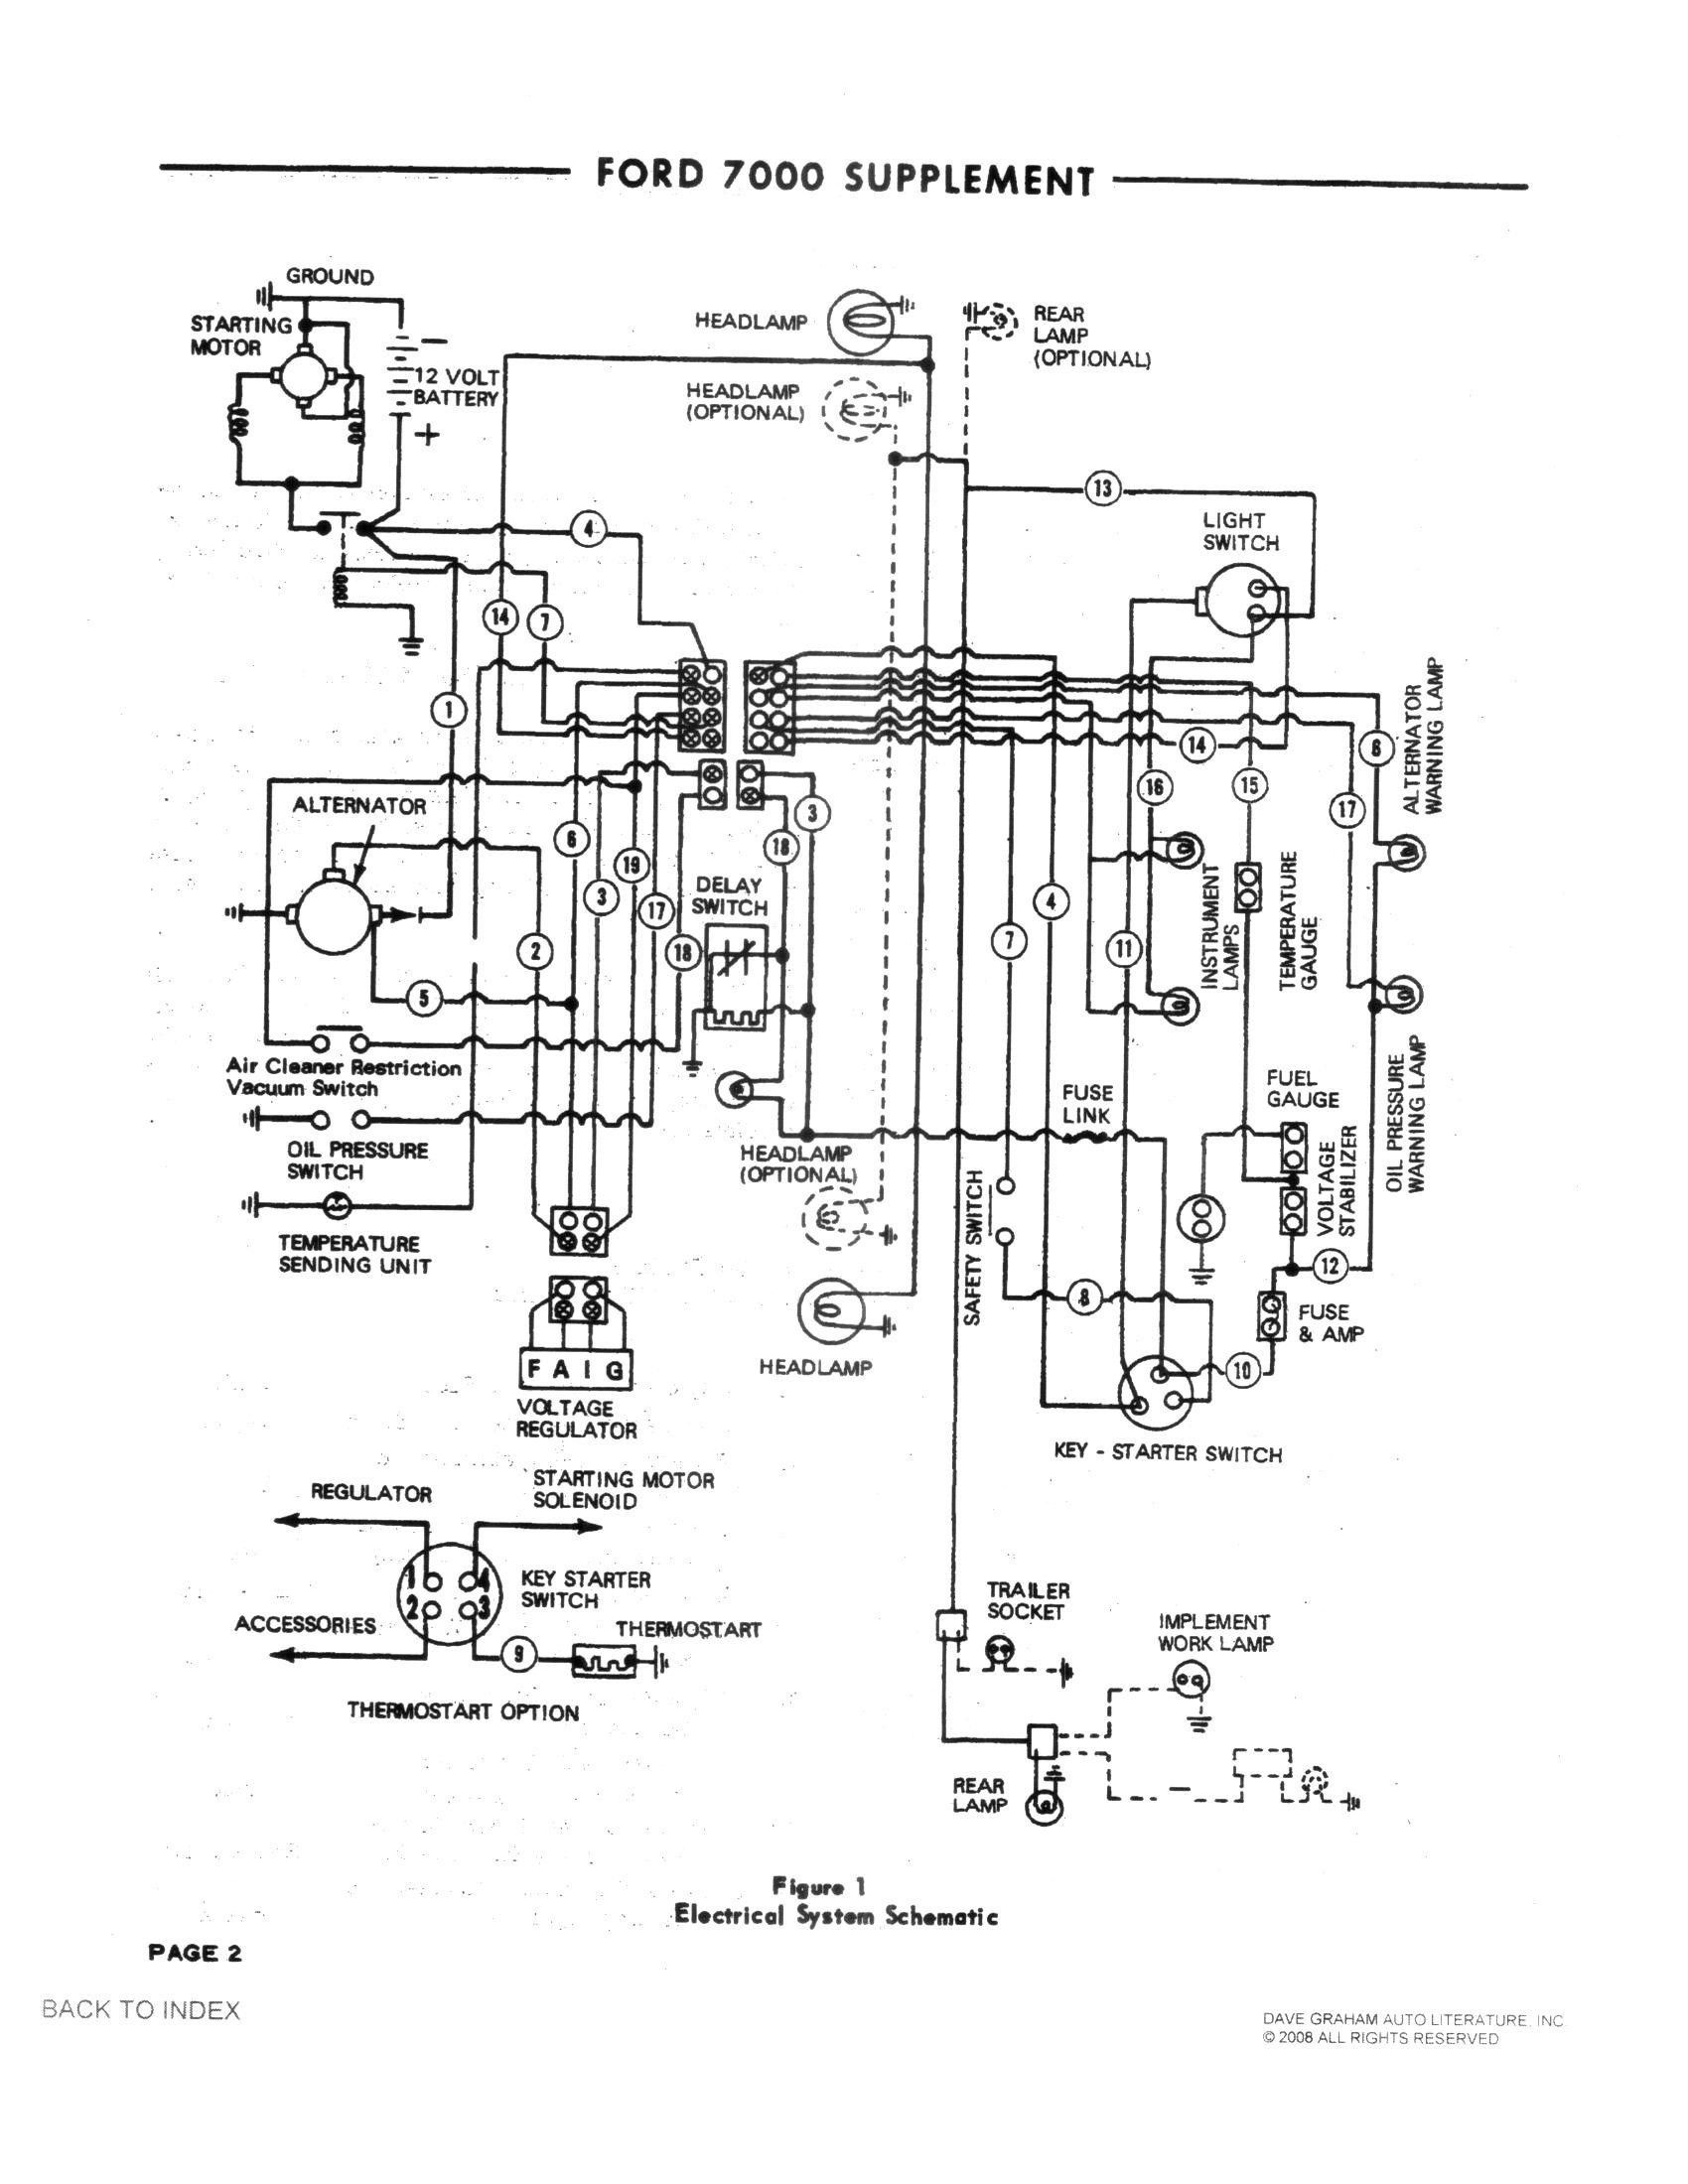 Unique Electrical Wiring Diagram Sample Free #diagram #